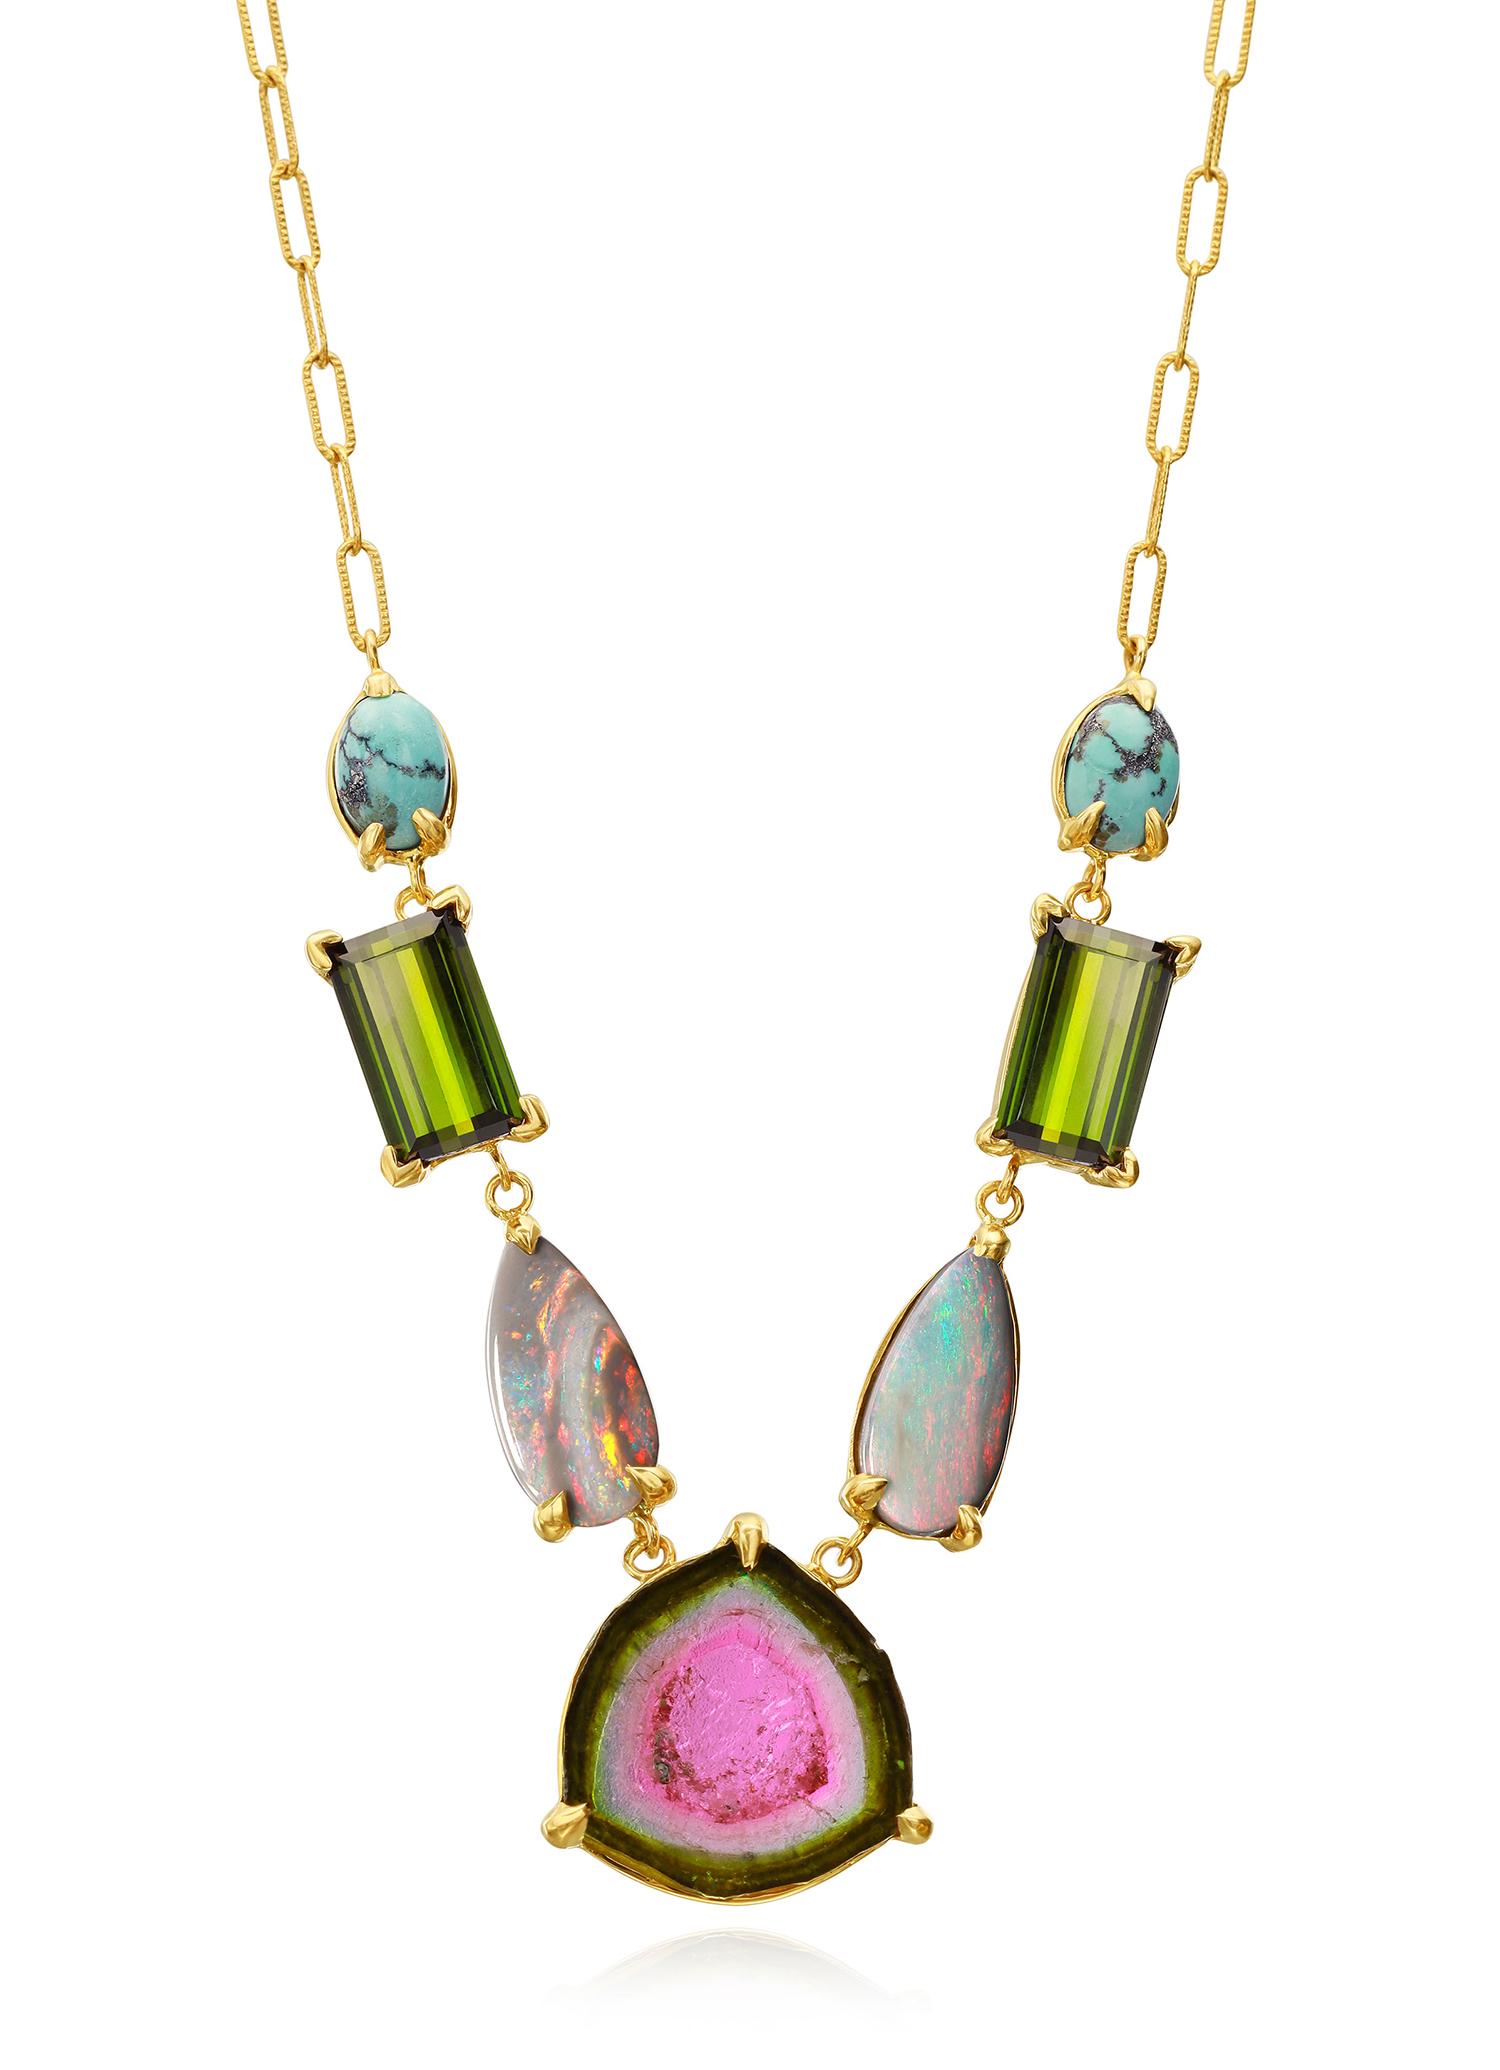 INSTORE Design Awards 2021 – Colored Stone OVER $5,000